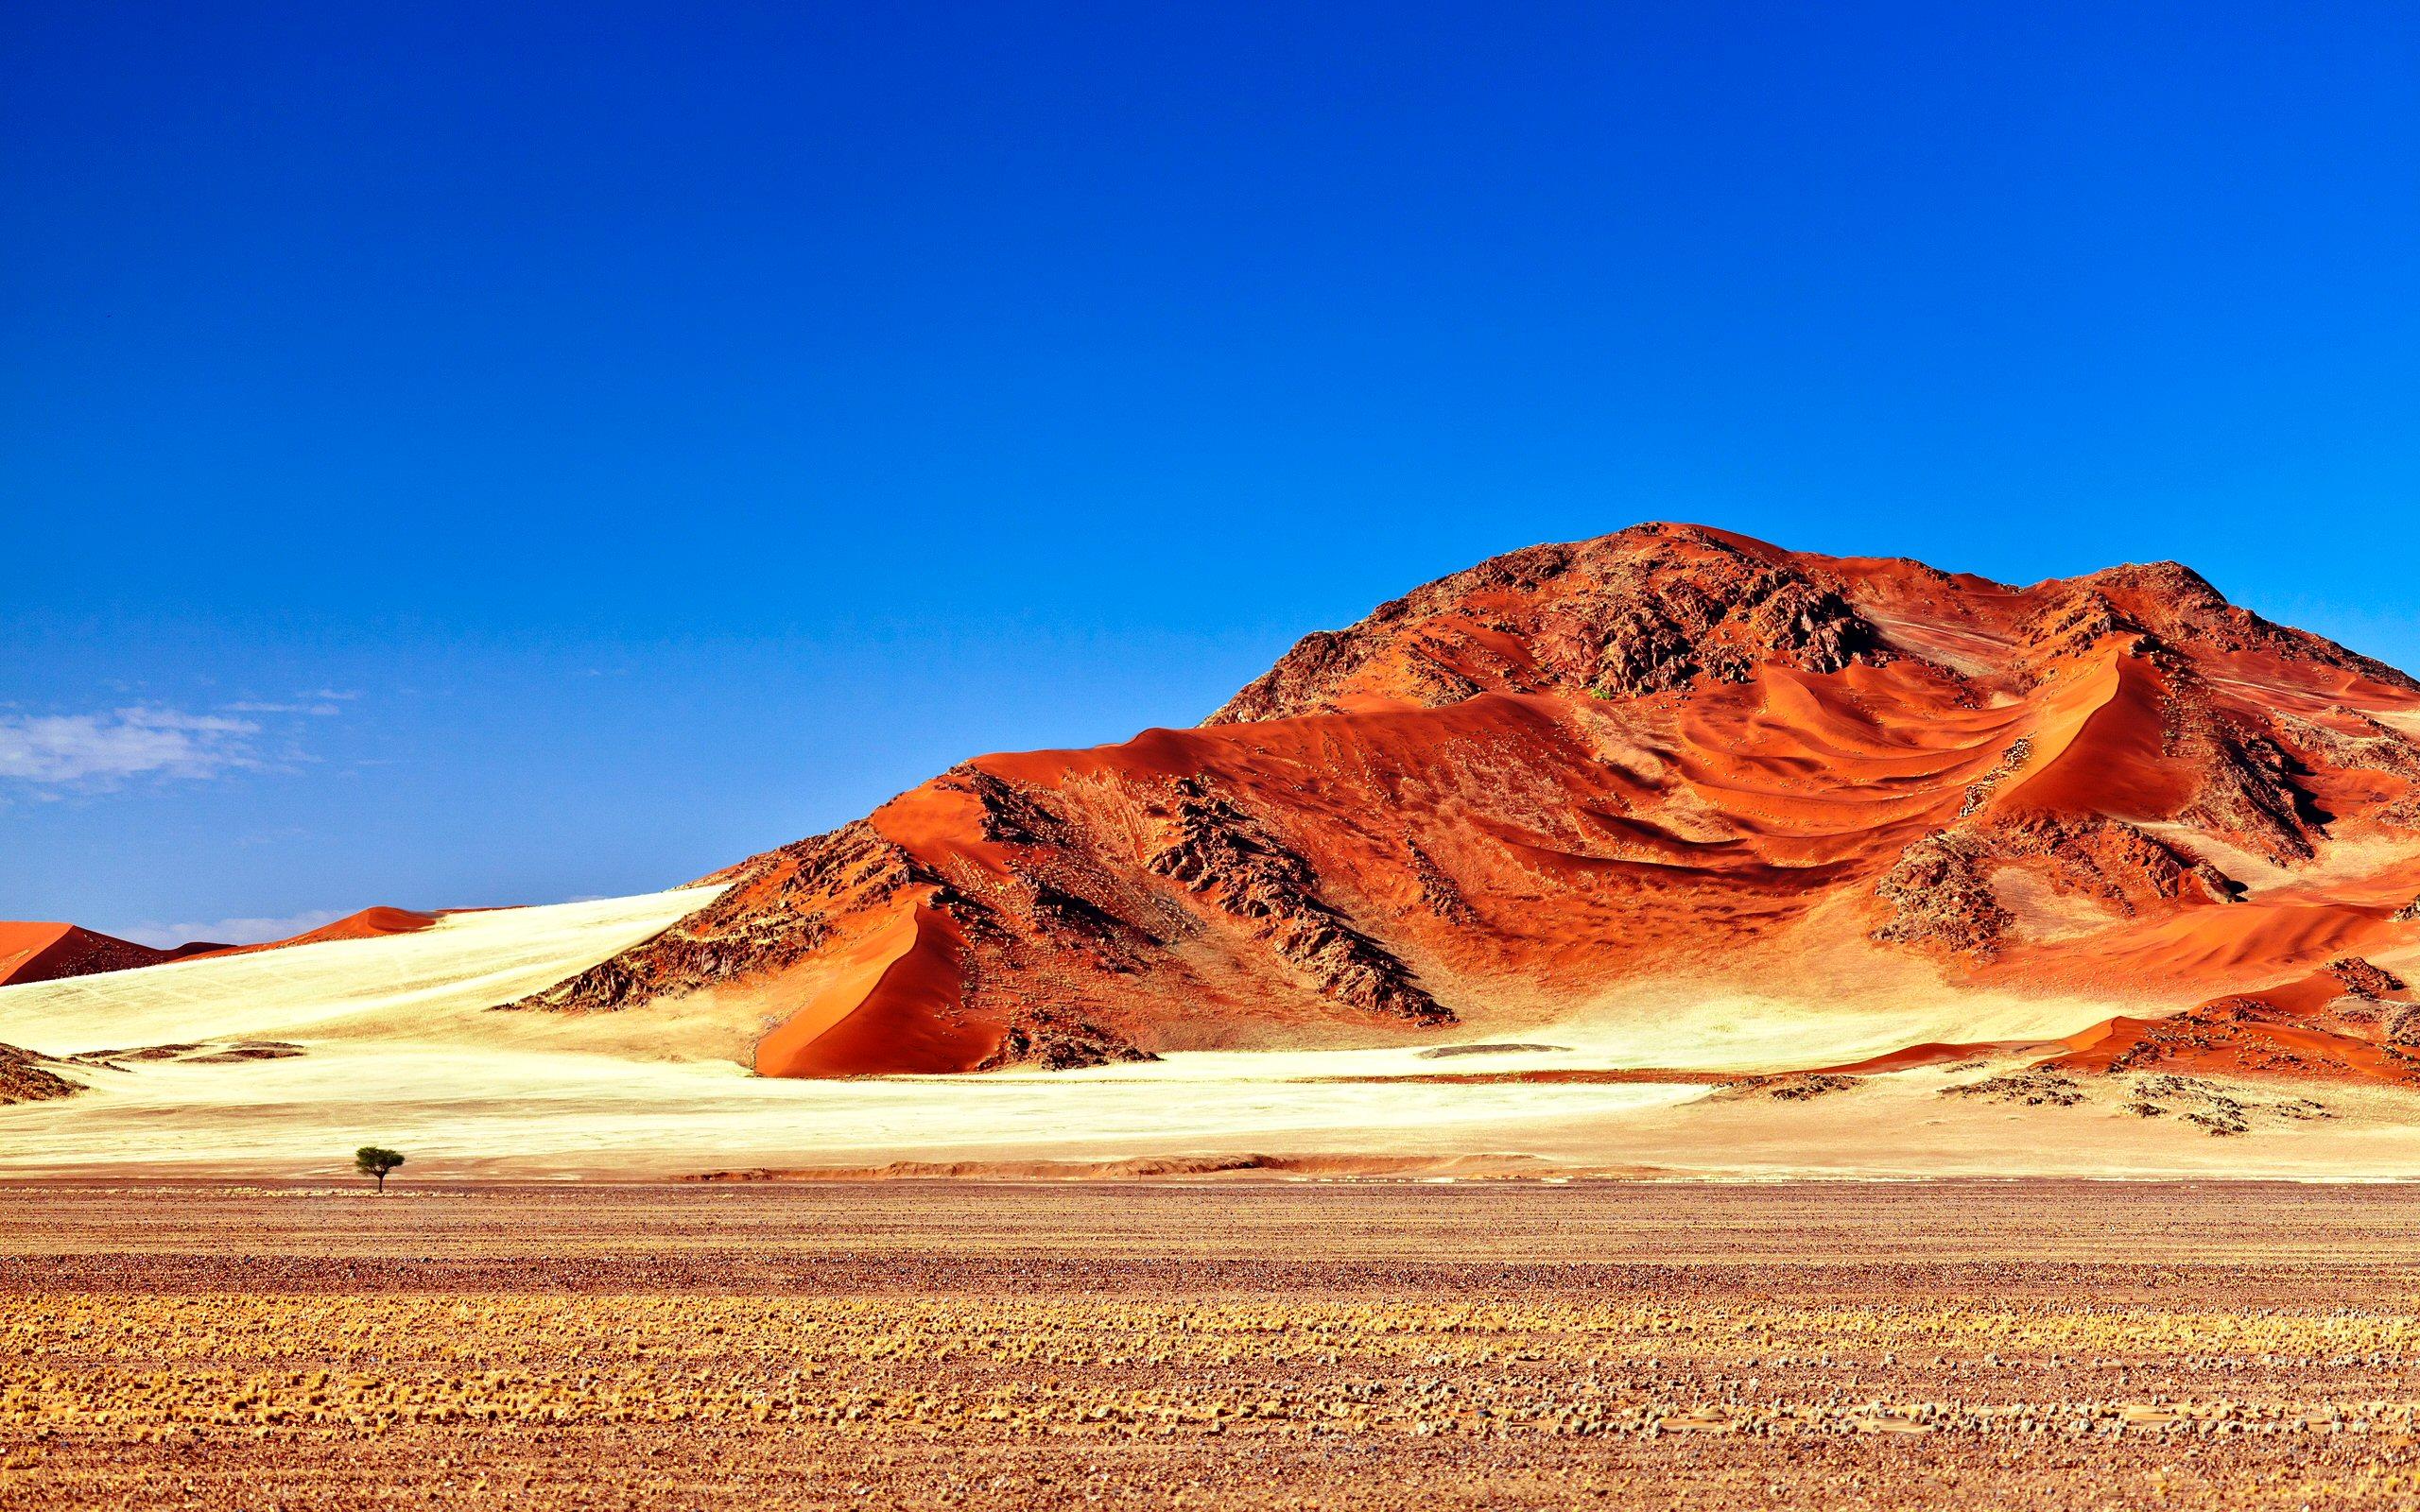 Dbz 1080p Wallpaper Best Dbz Quotes Desert Backgrounds Free Download Pixelstalk Net